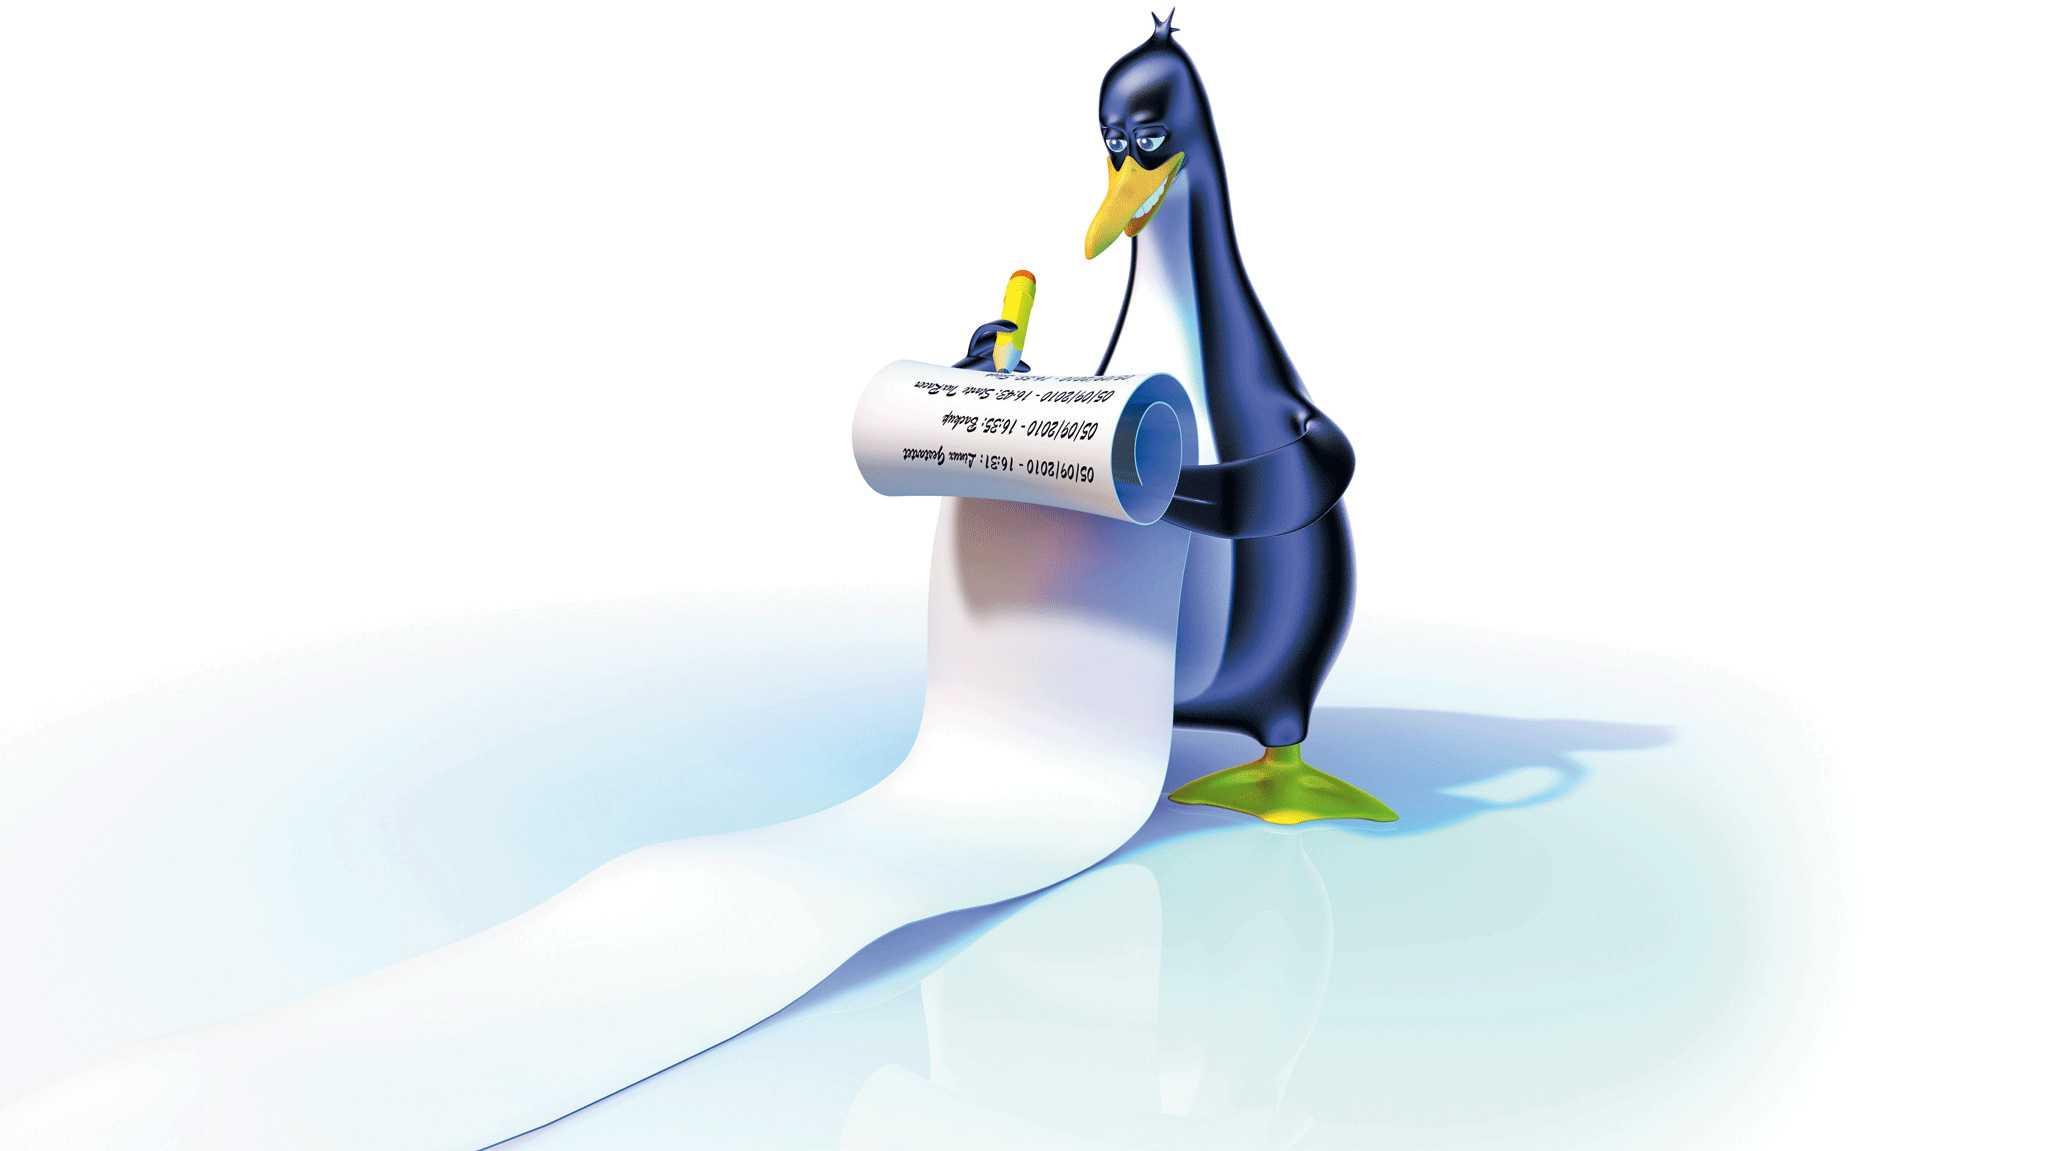 Linux 4.19